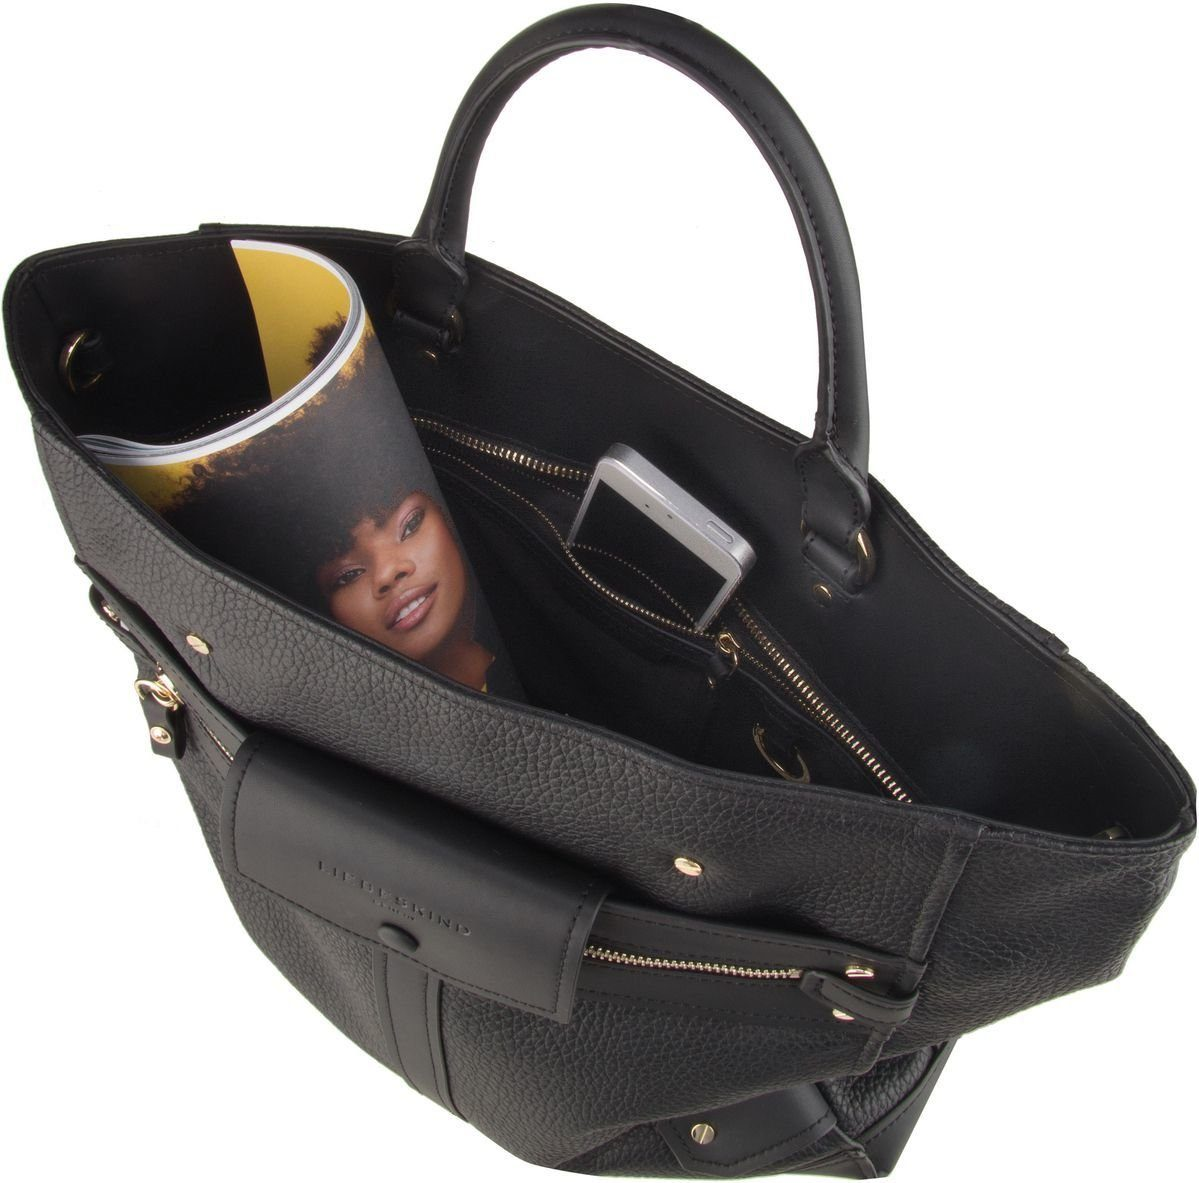 Pocket M« Berlin »neo Liebeskind Casual Handtasche Tote xICqF1w